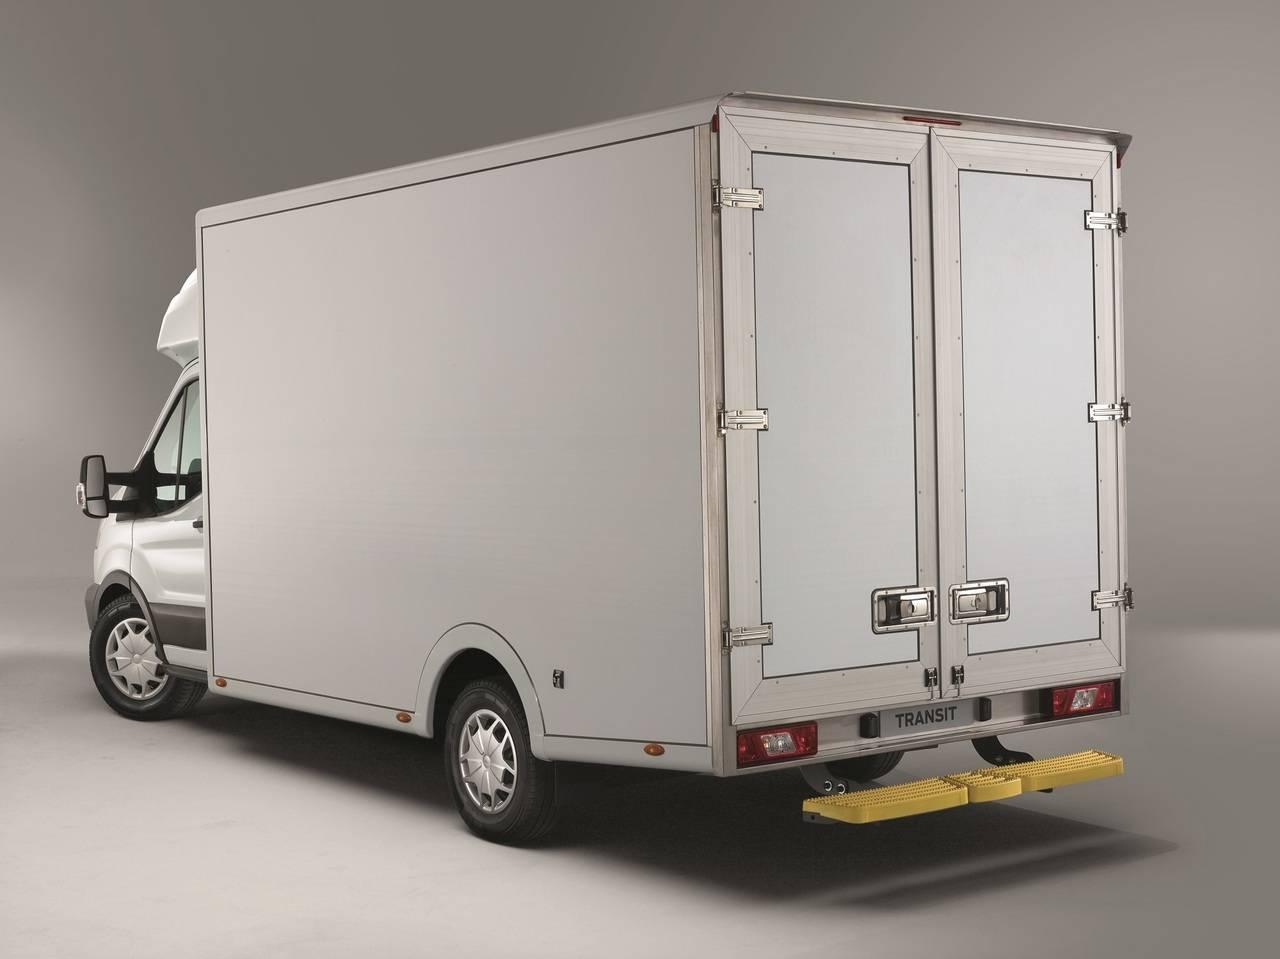 Llega la nueva Ford Transit Chasis cabina de piso bajo